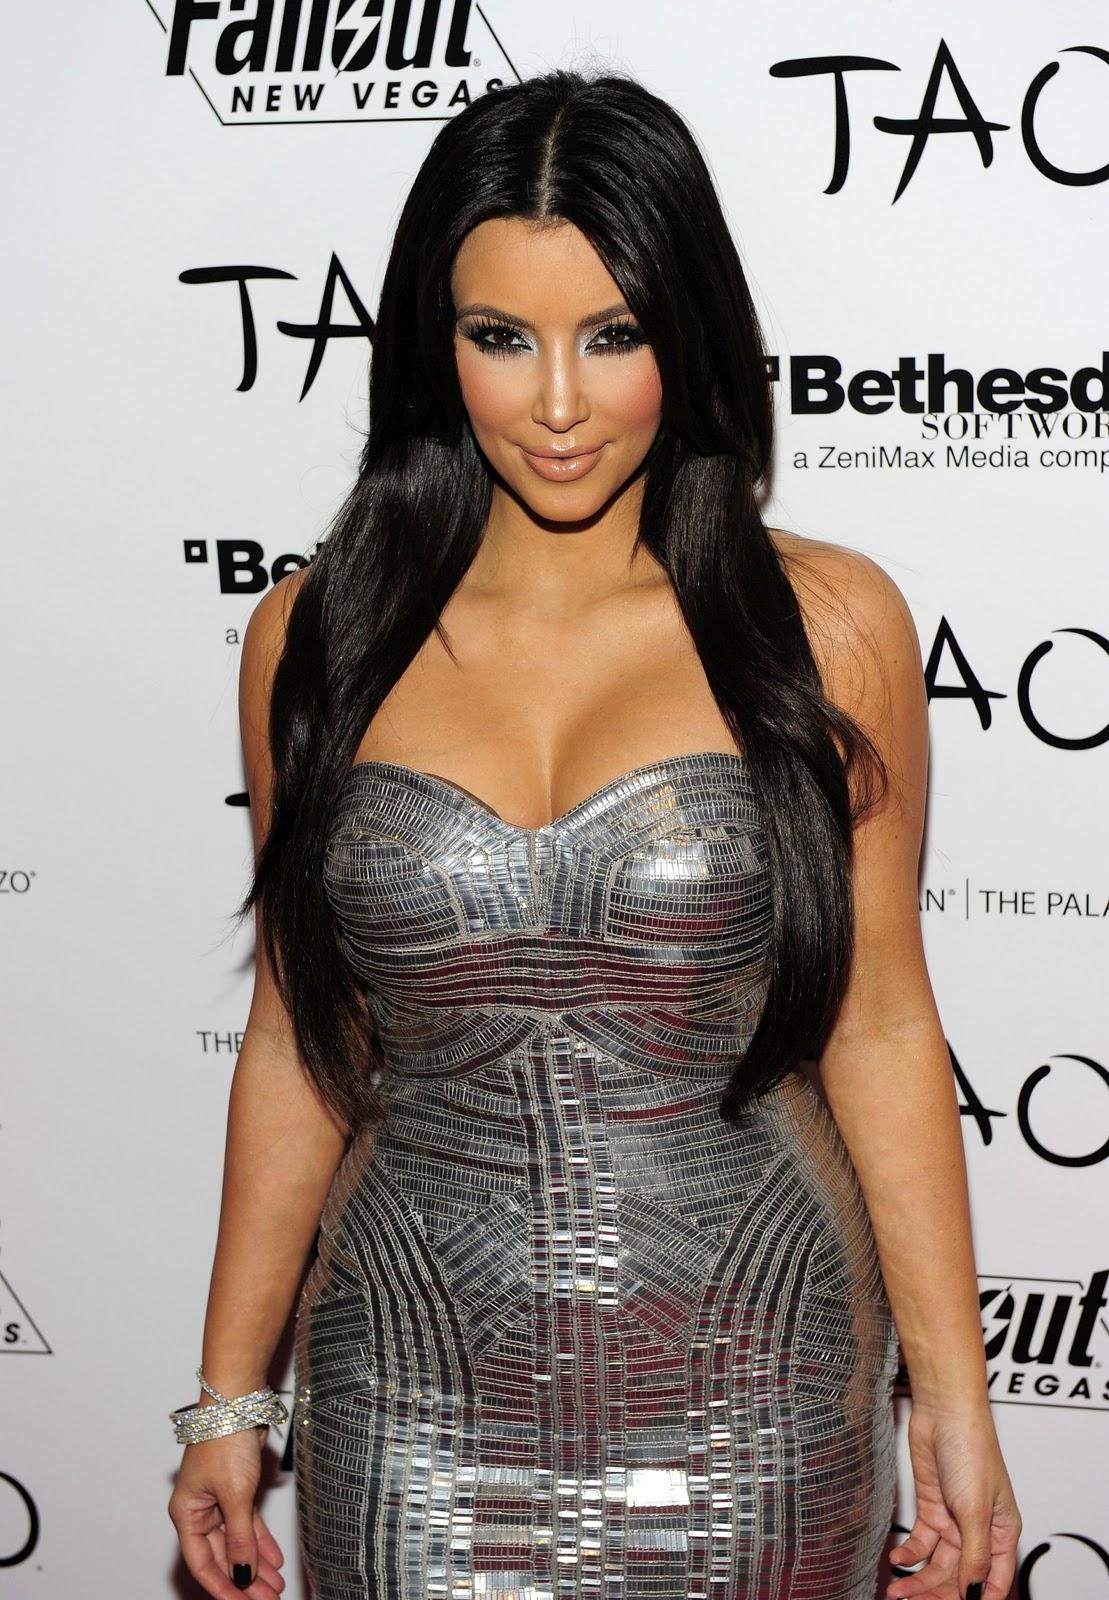 http://3.bp.blogspot.com/_hv8J7VEOAVE/TLqYx24tIpI/AAAAAAAAAHk/TQZ6nriYv5g/s1600/Kim-Kardashian30_ReSiDuO+%283%29.jpg